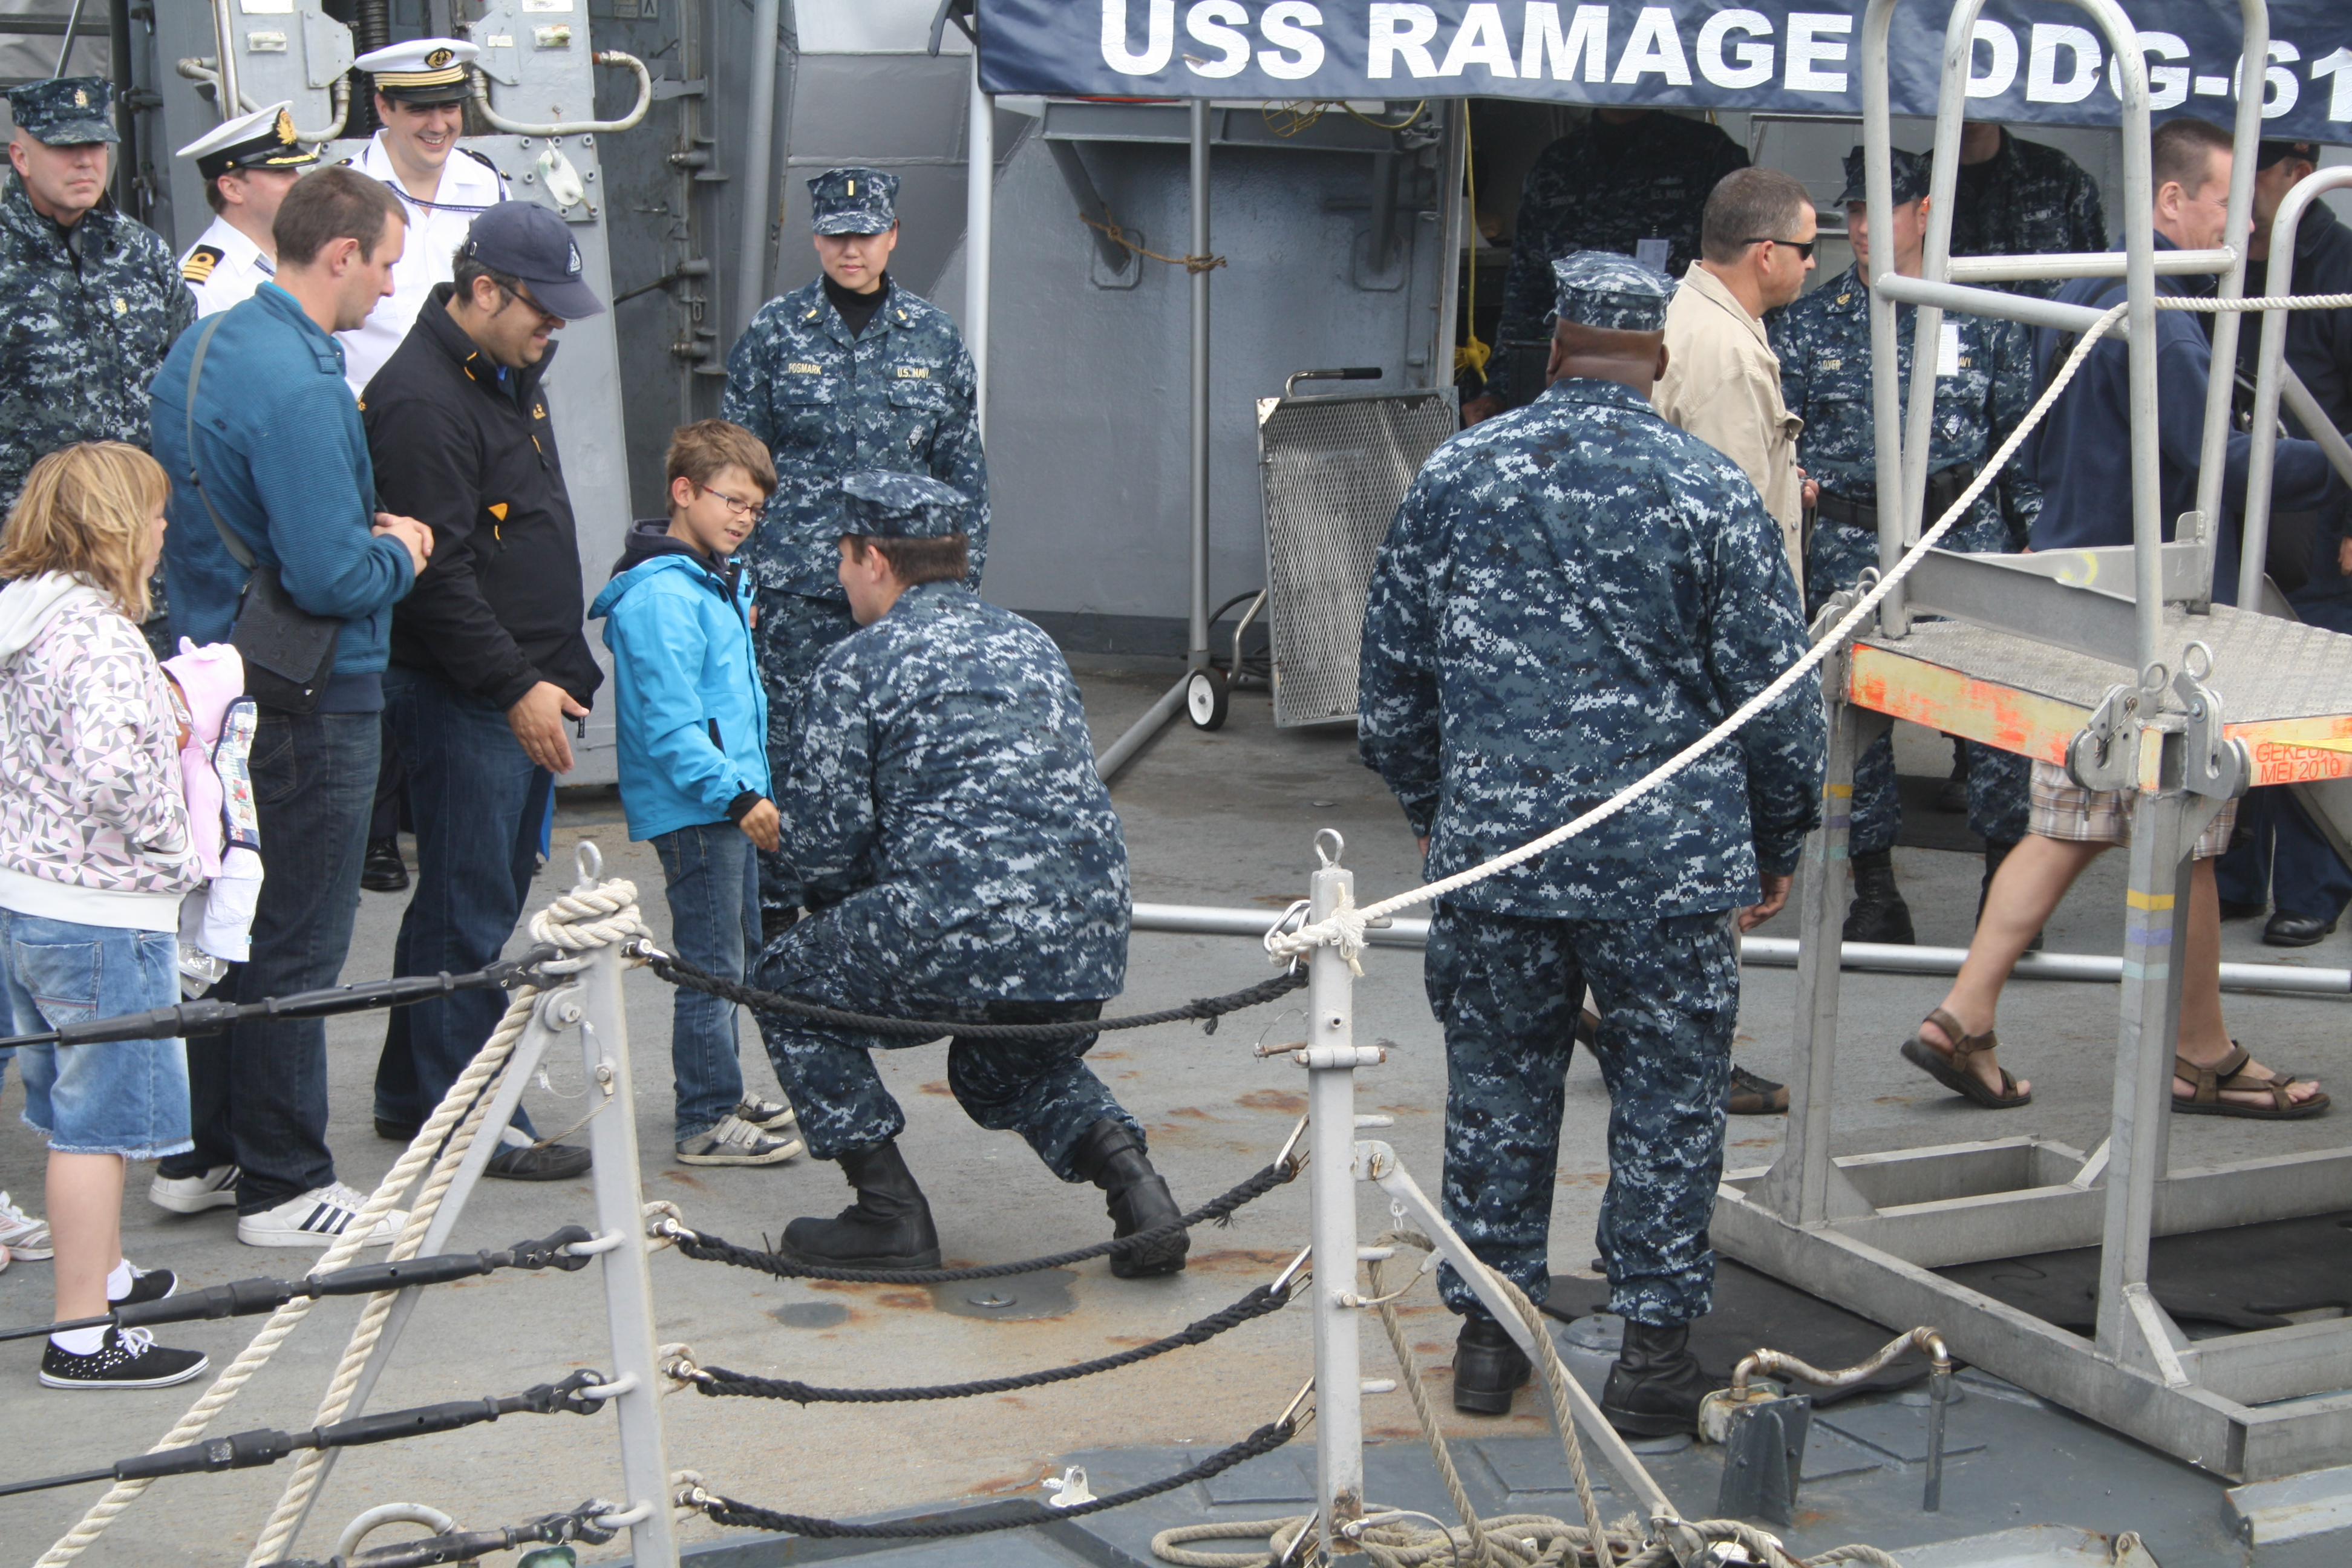 Portes ouvertes 2011 - Navy Days Zeebrugge 2011   - Page 5 1107111153531095838454835